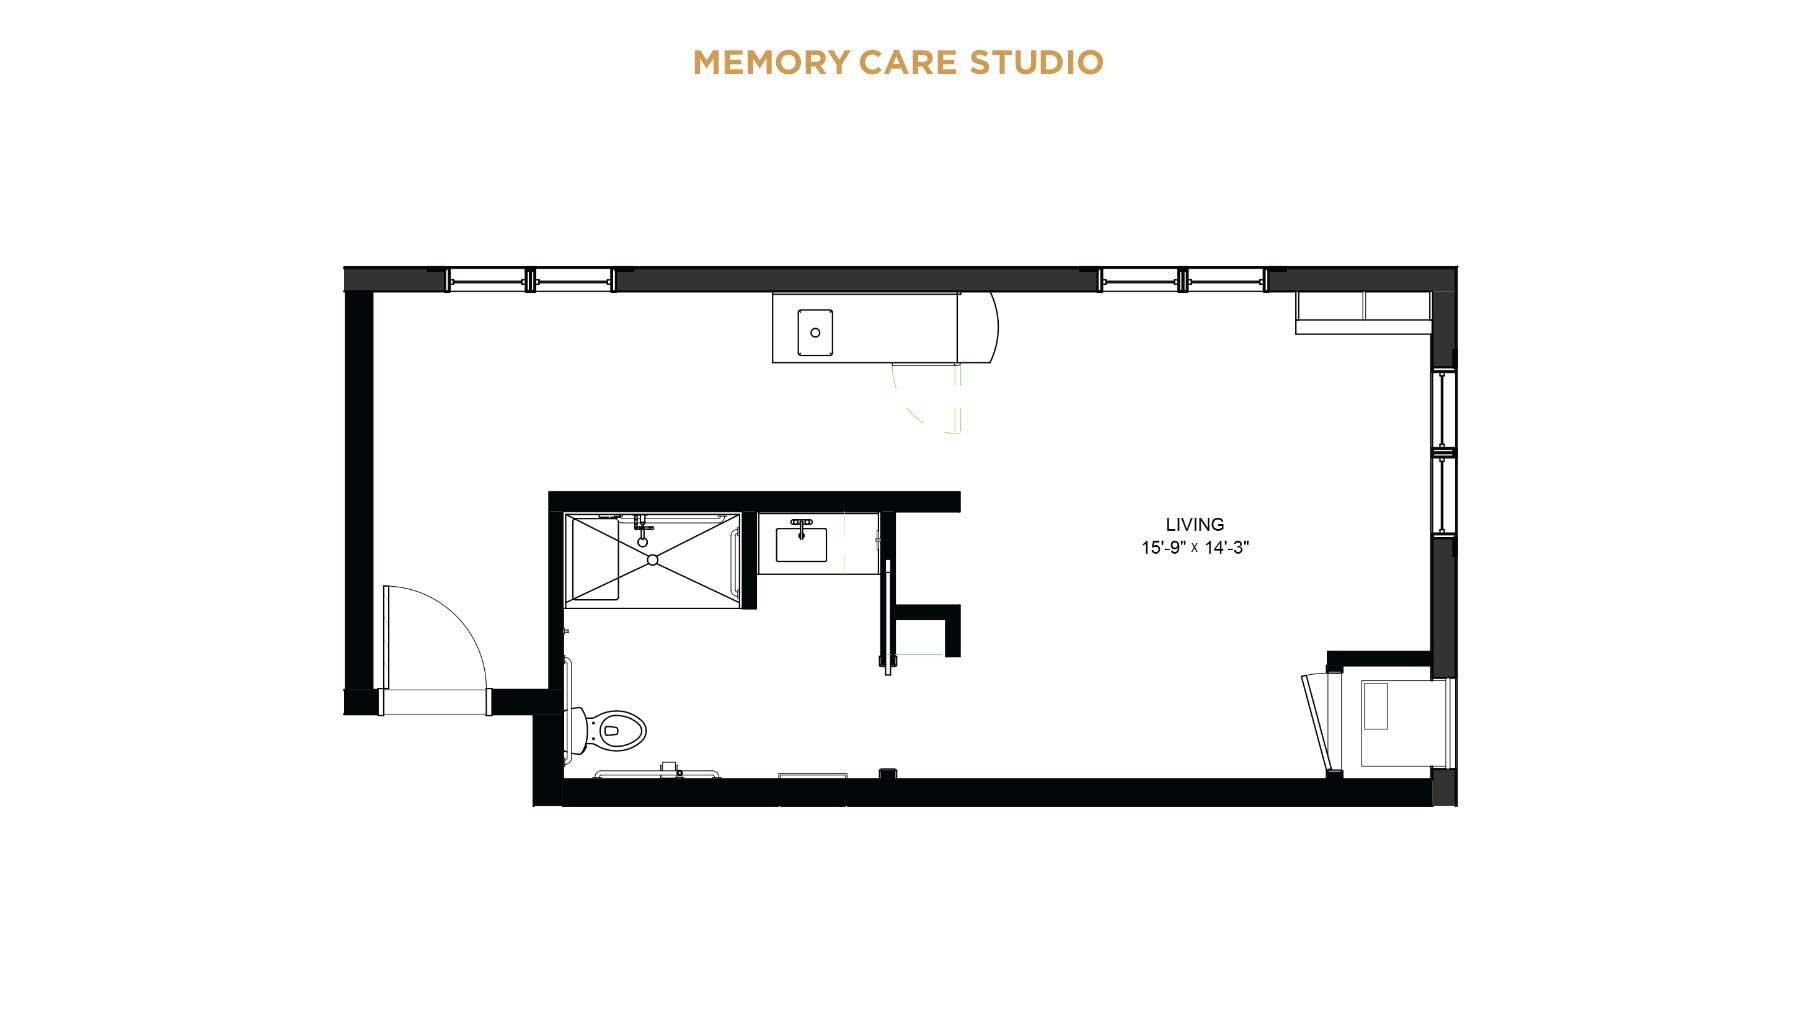 memory care studio floorplan